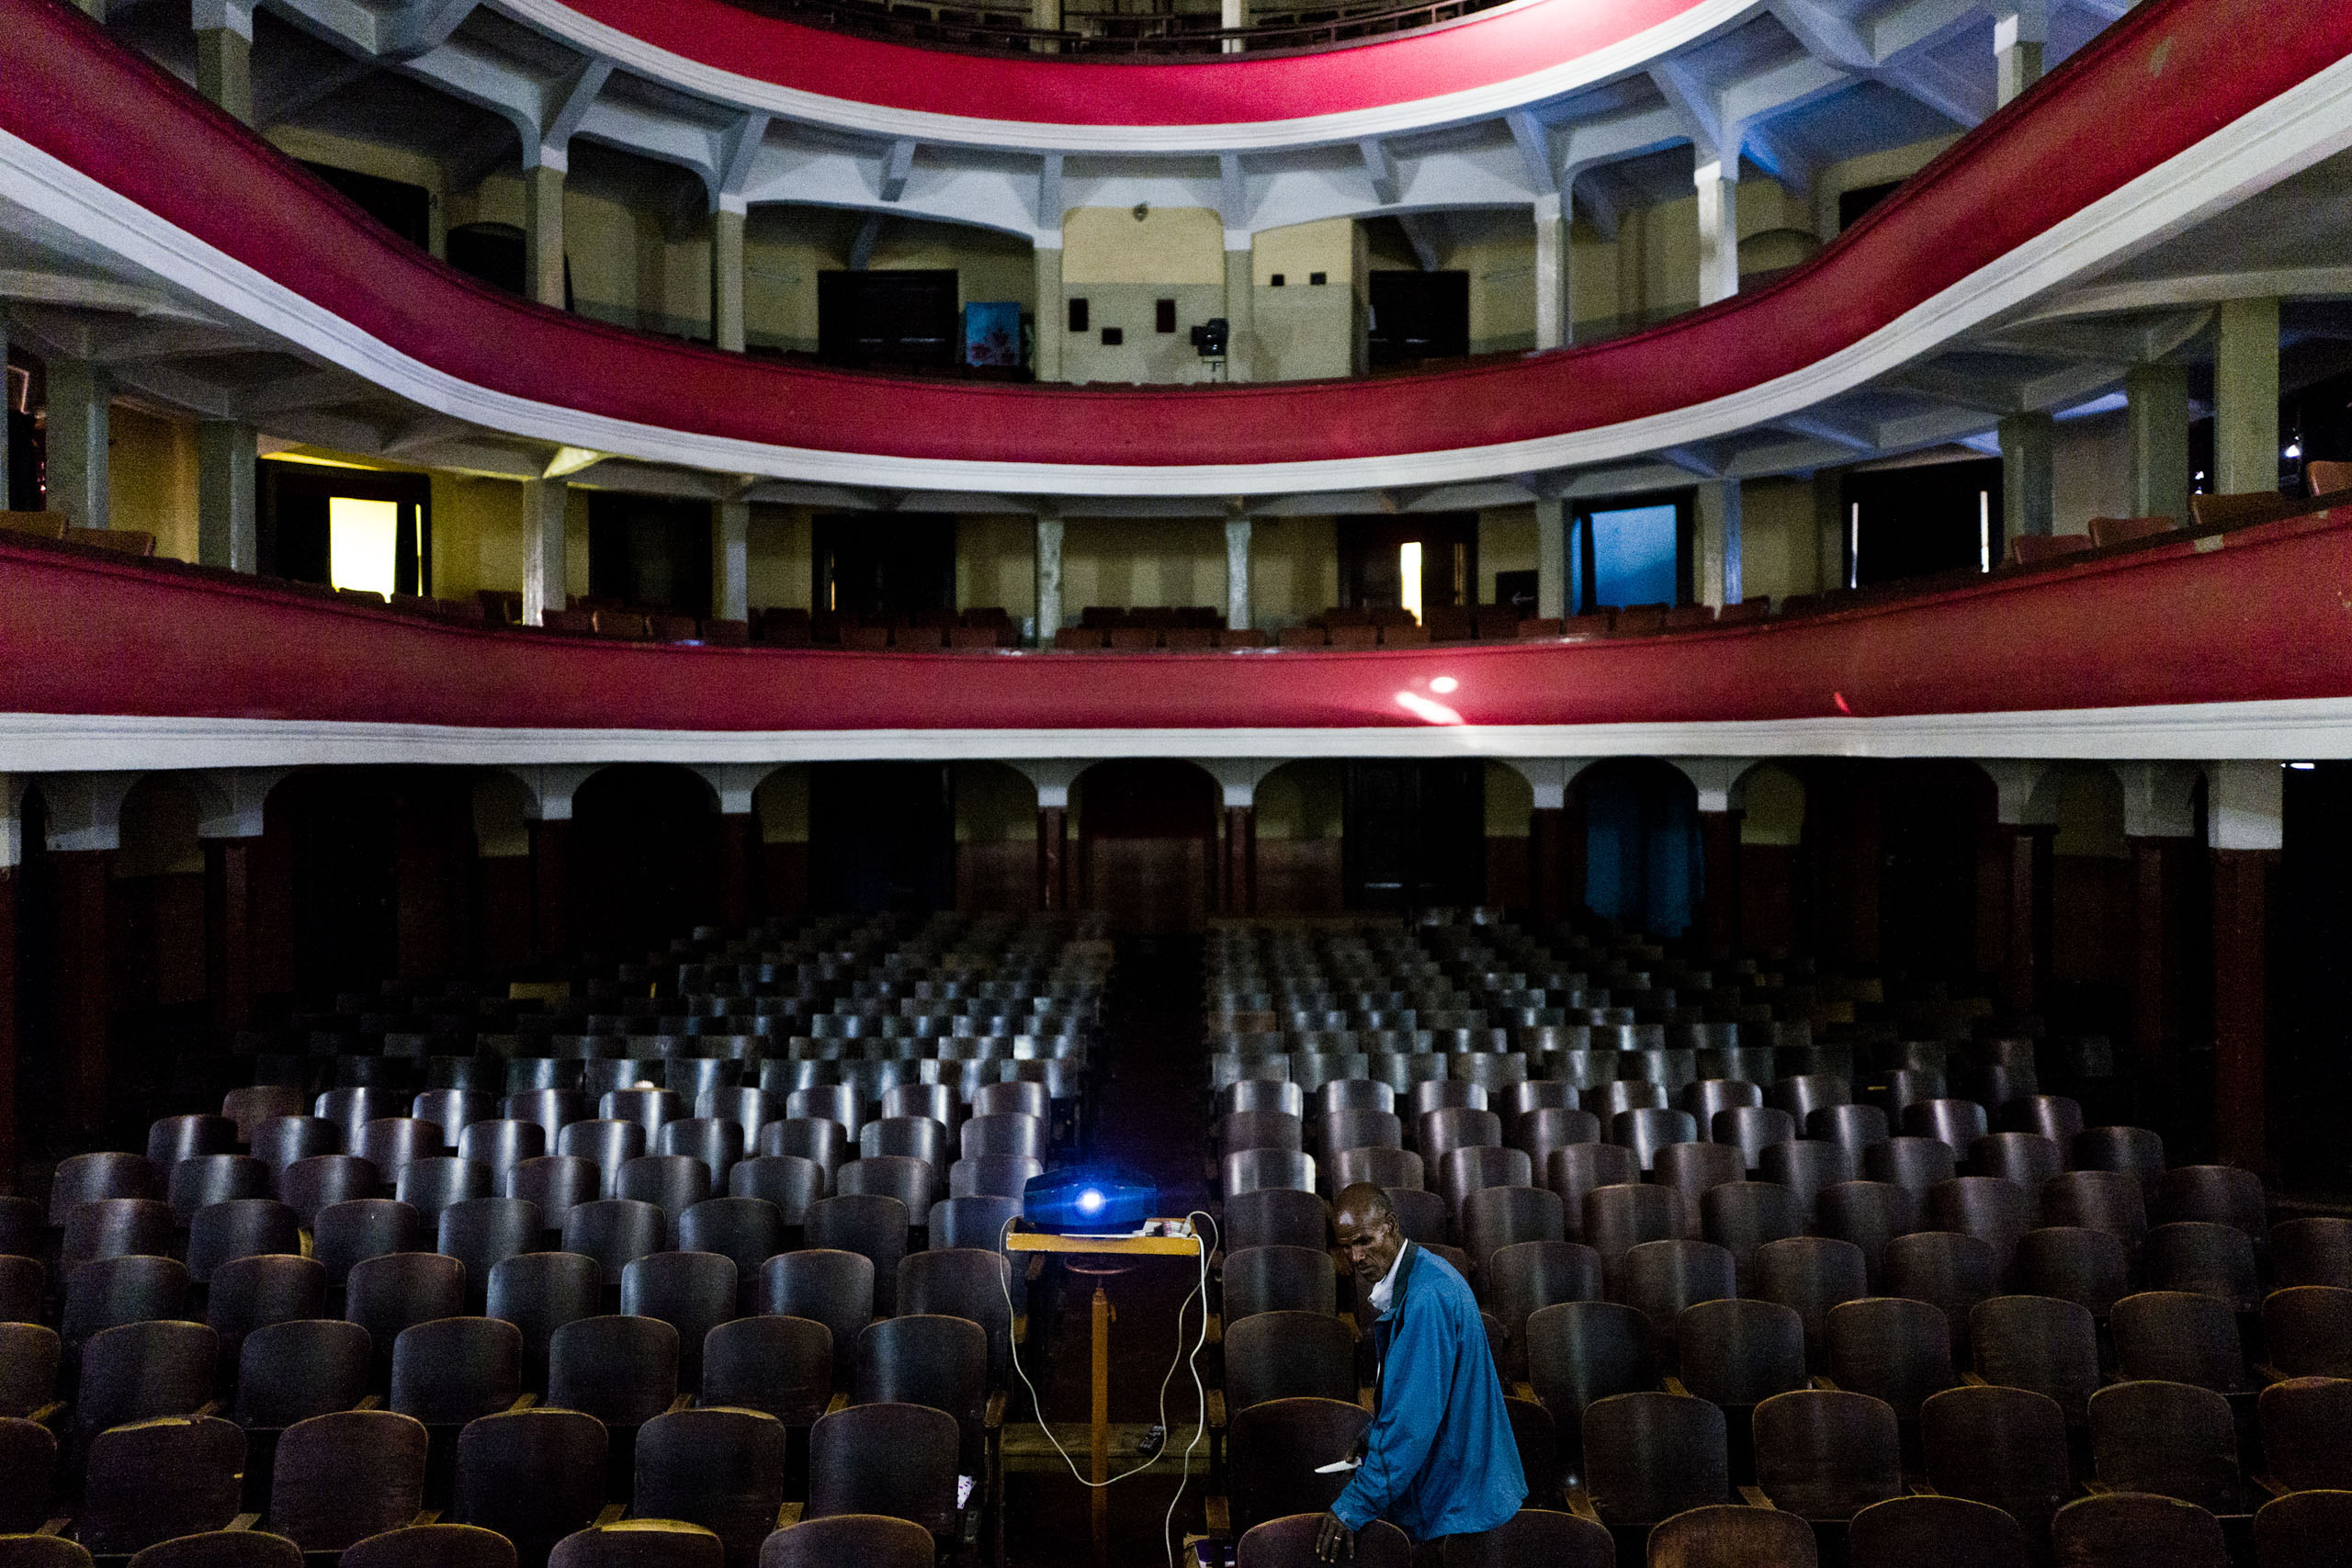 Interior of Asmara's Opera house.